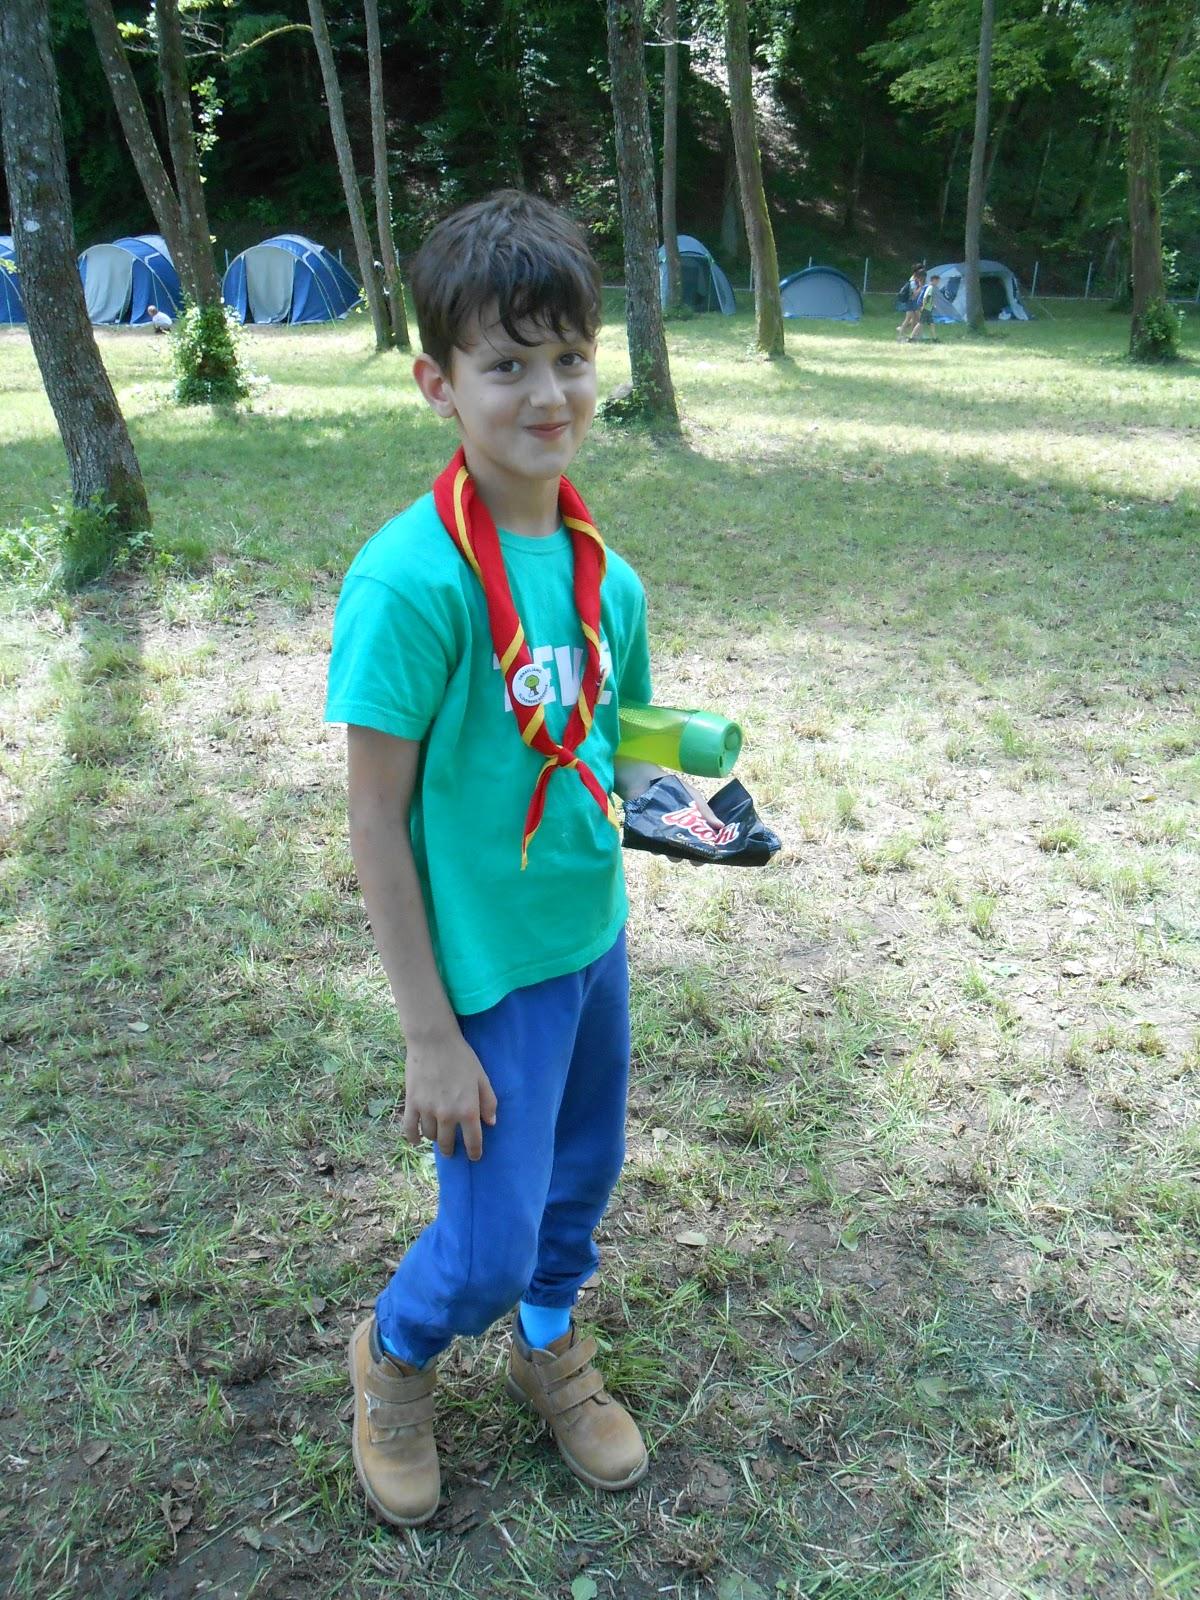 Državni mnogoboj, Mirna 2016 - DSCN5512.JPG